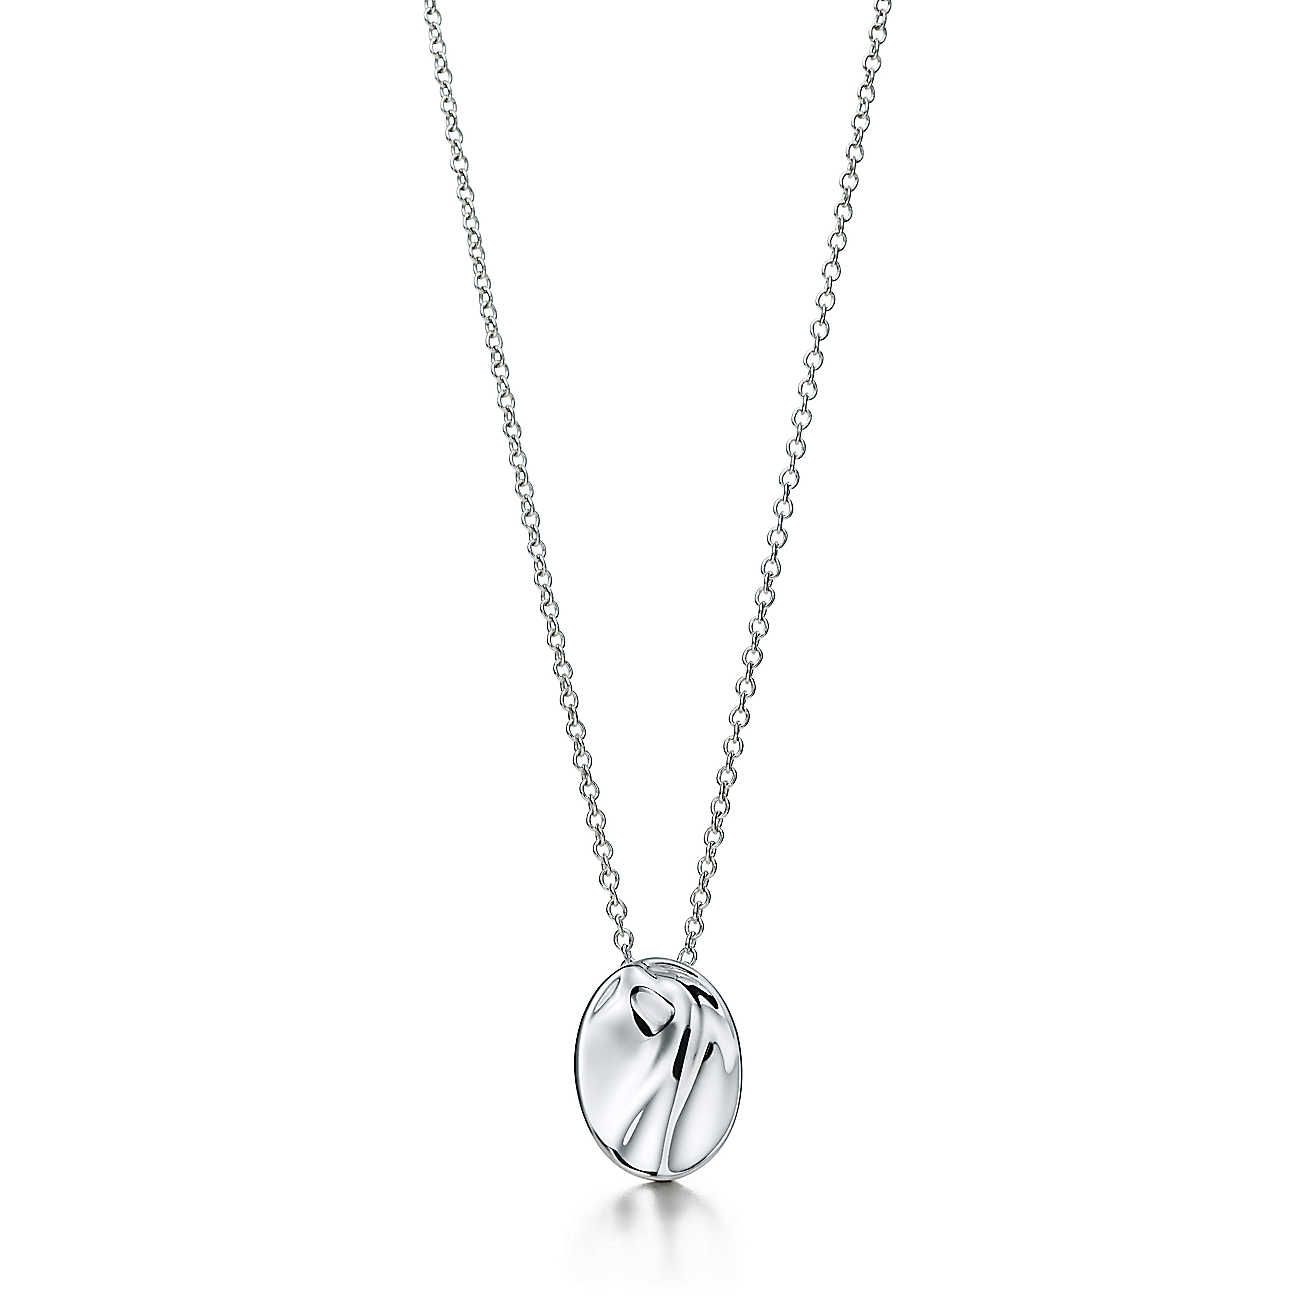 790af57b9 Elsa Peretti® Zodiac pendant | Aquarius | Elsa peretti, Pendants ...